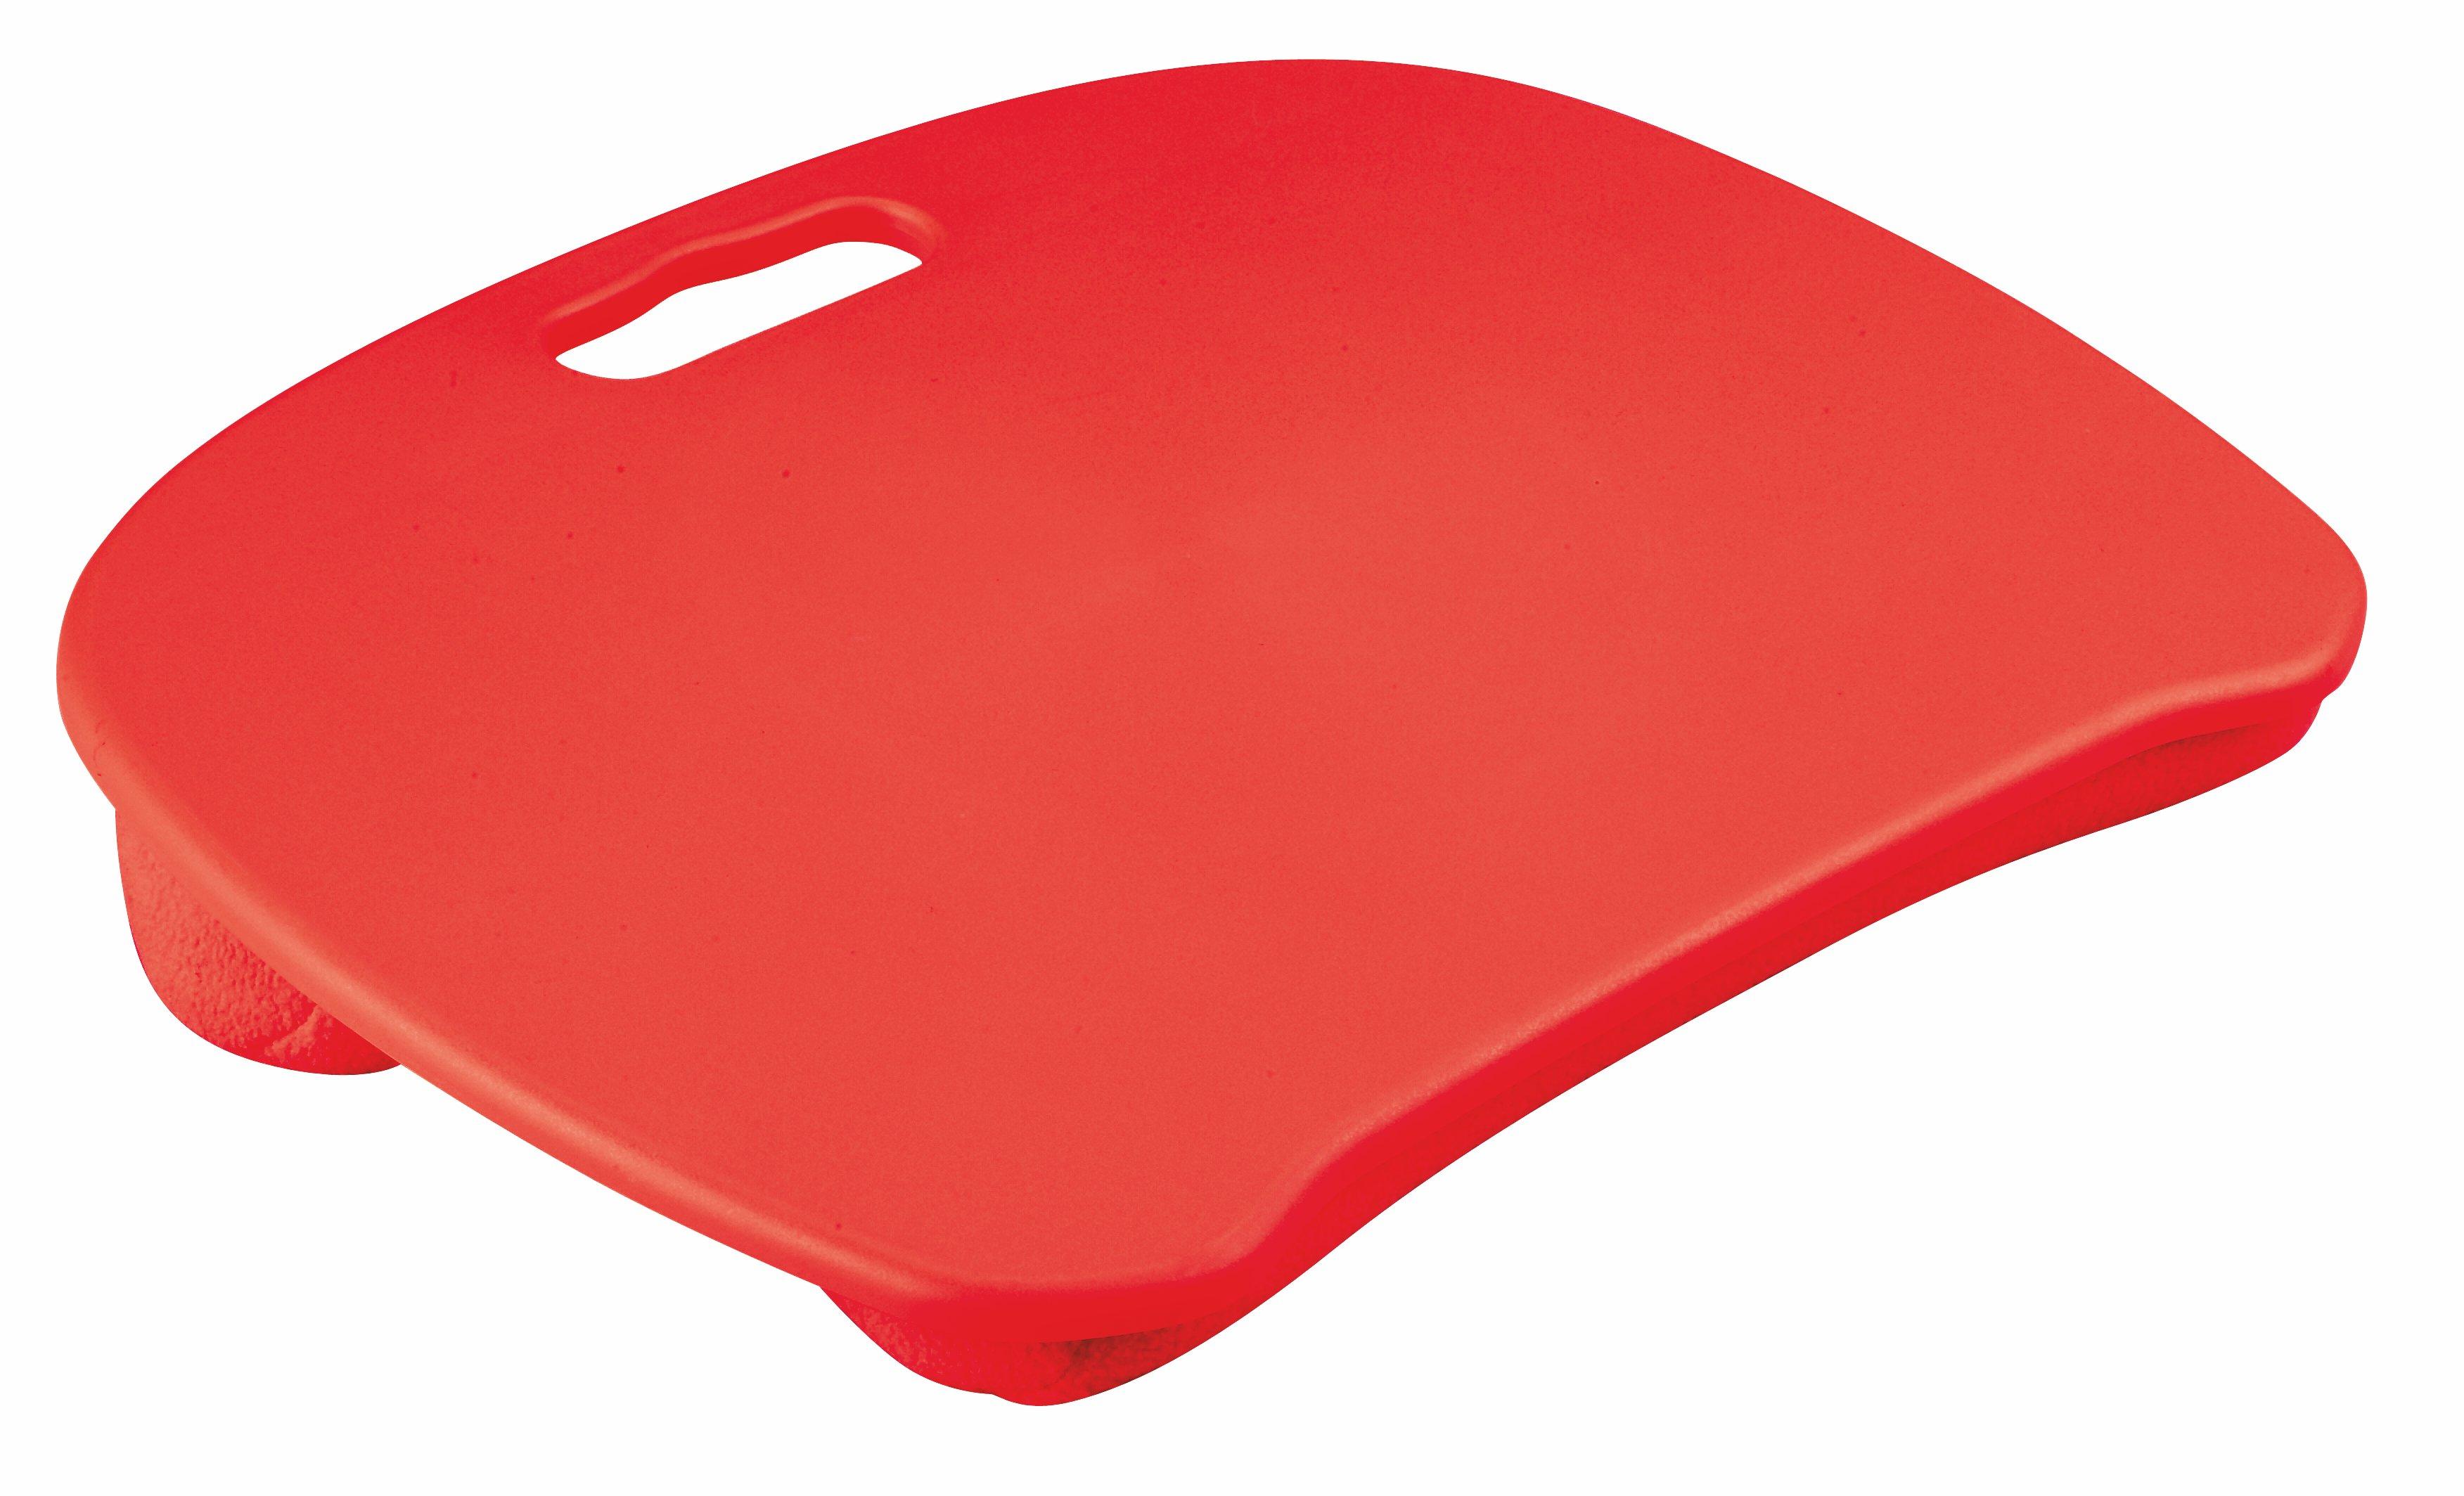 Suport laptop rosu B-28 imagine